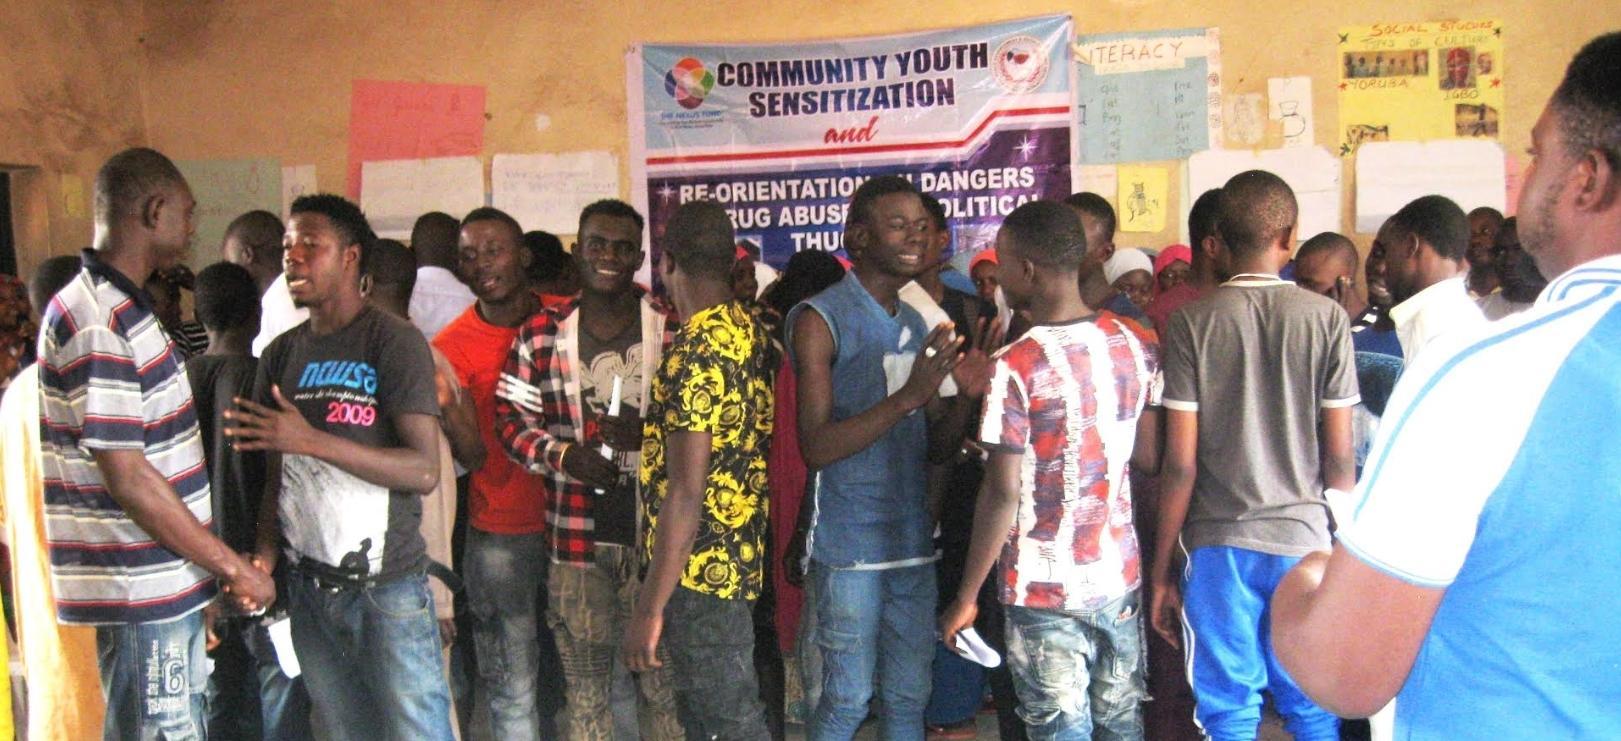 CPAED at a community youth sensitization